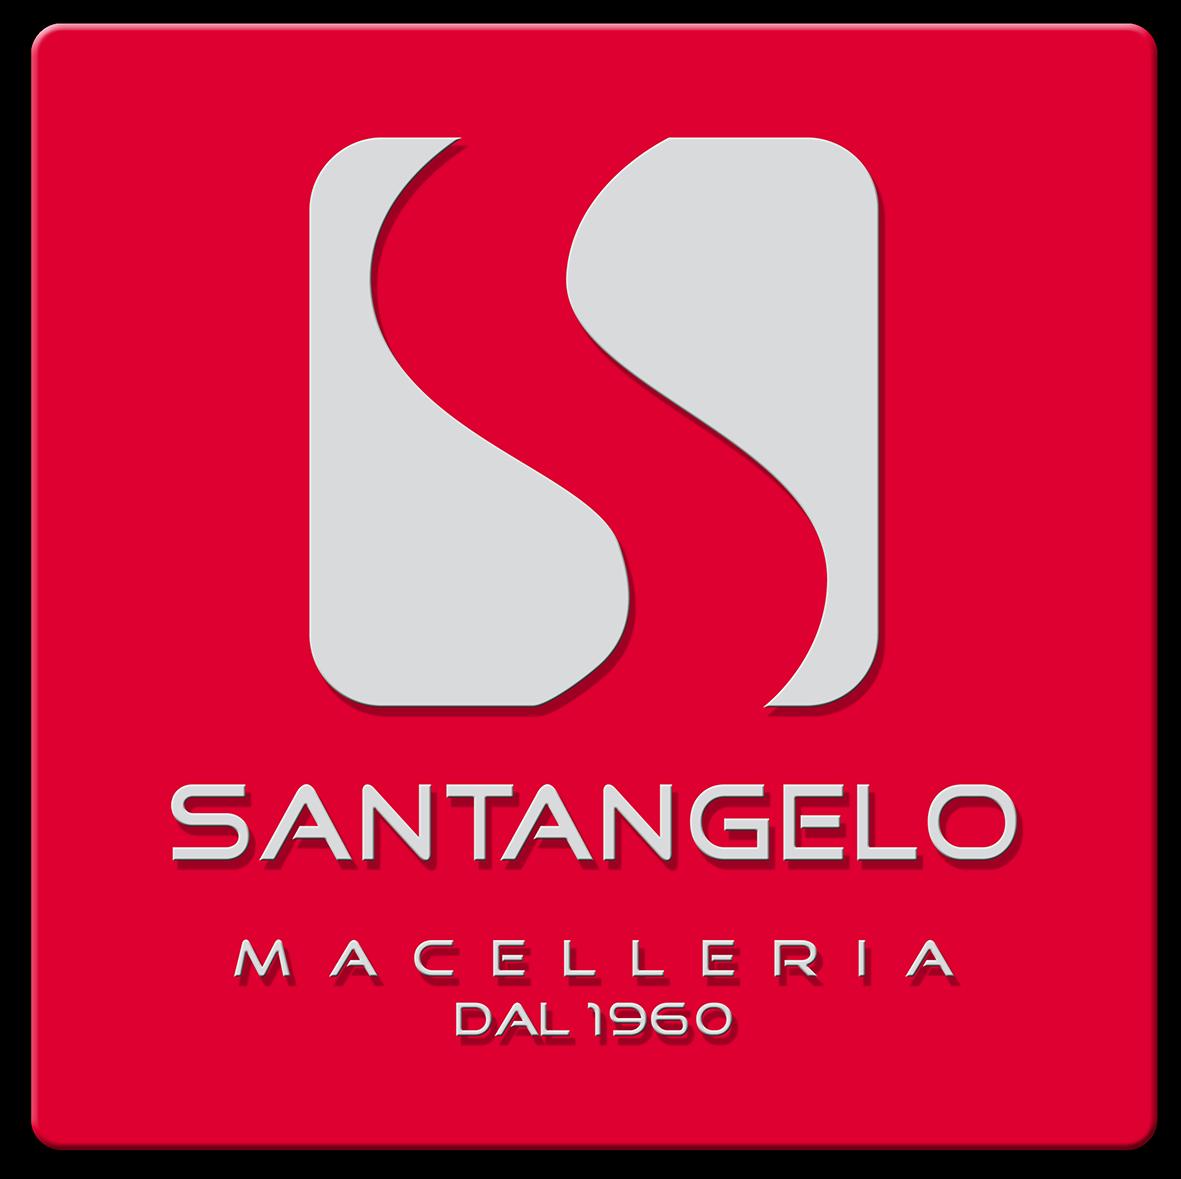 Macelleria Santangelo